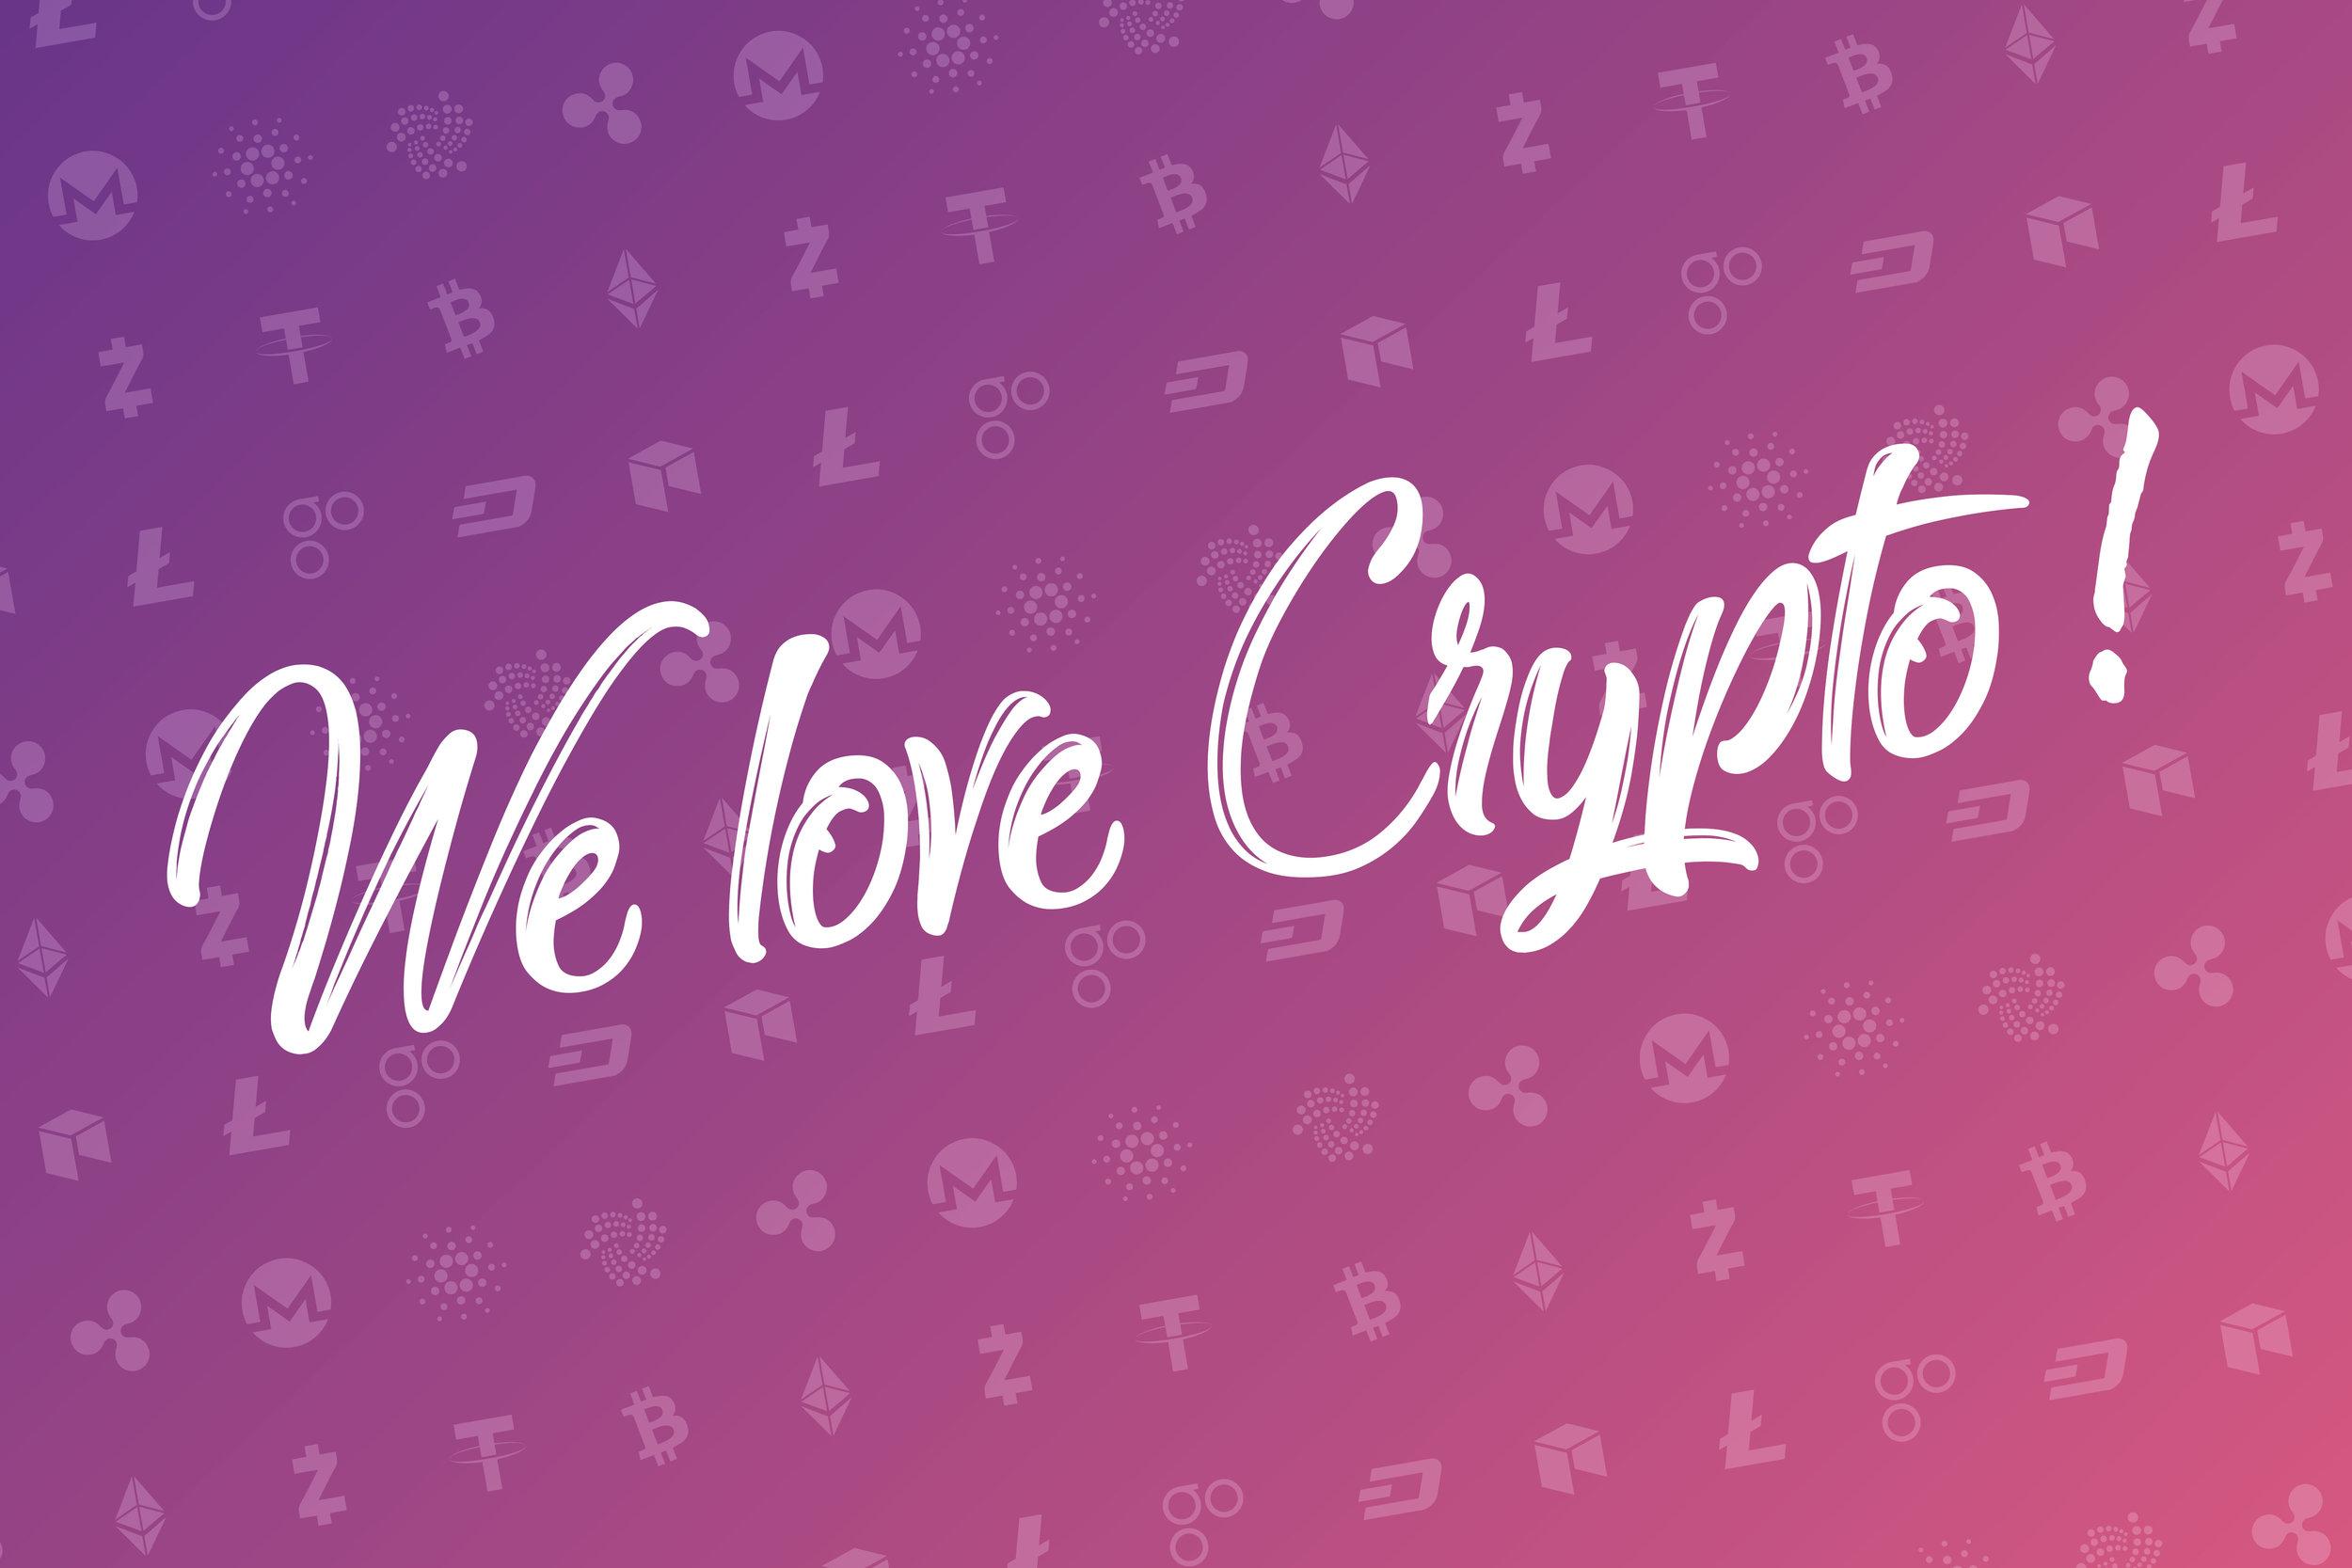 Creative-Pulse-crypto.jpg